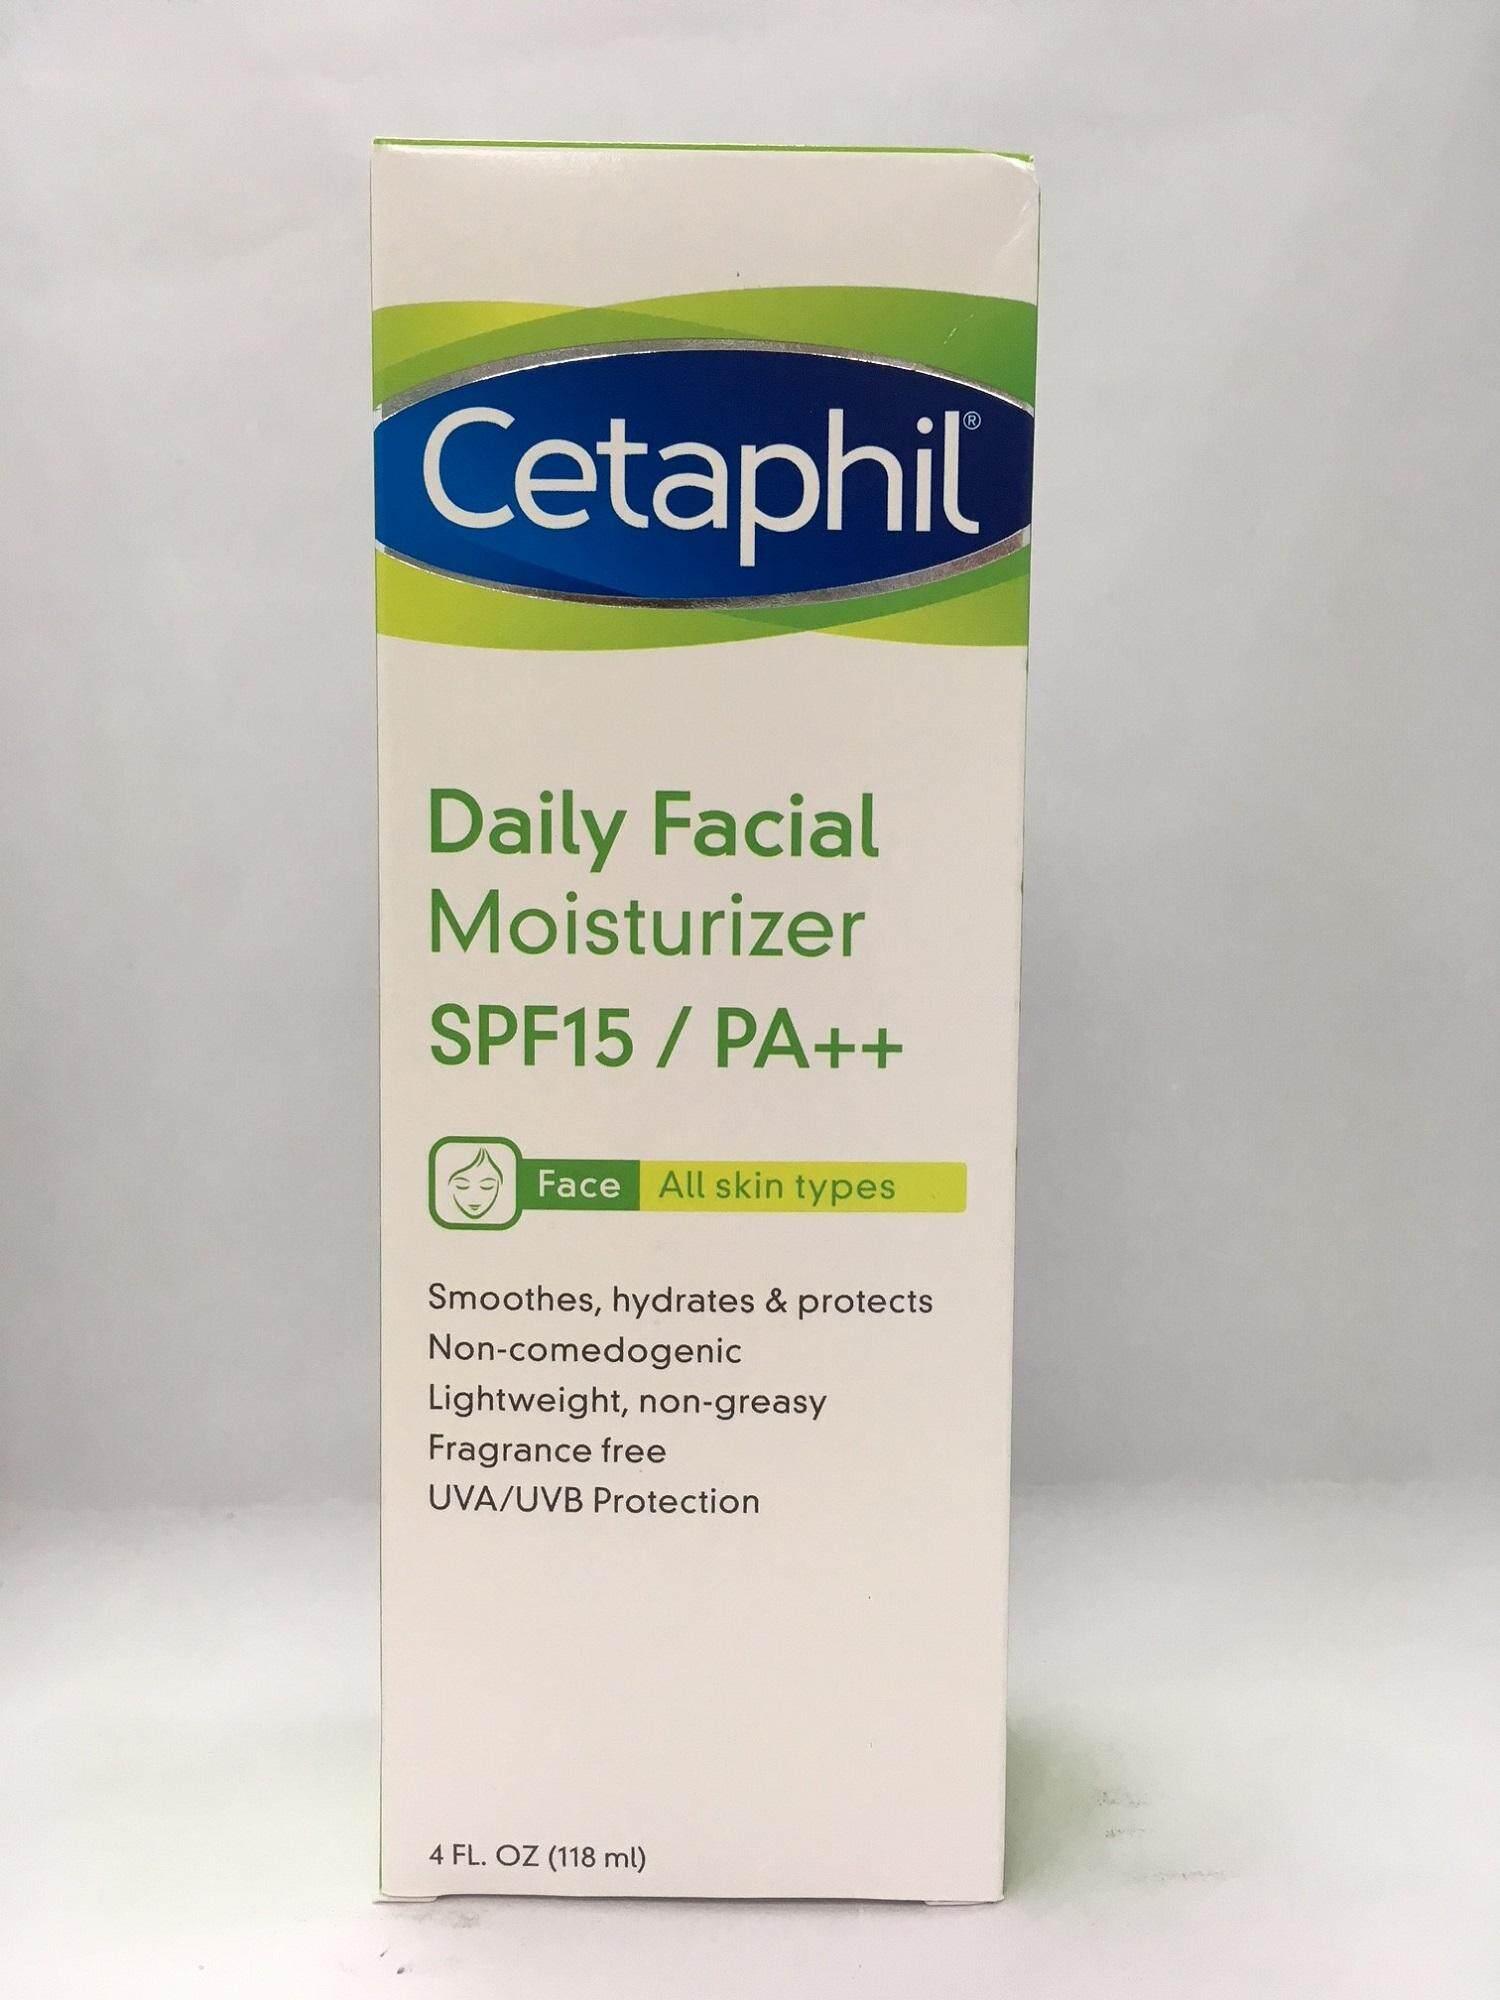 Cetaphil Daily Facial Moisturizer SPF15/PA+